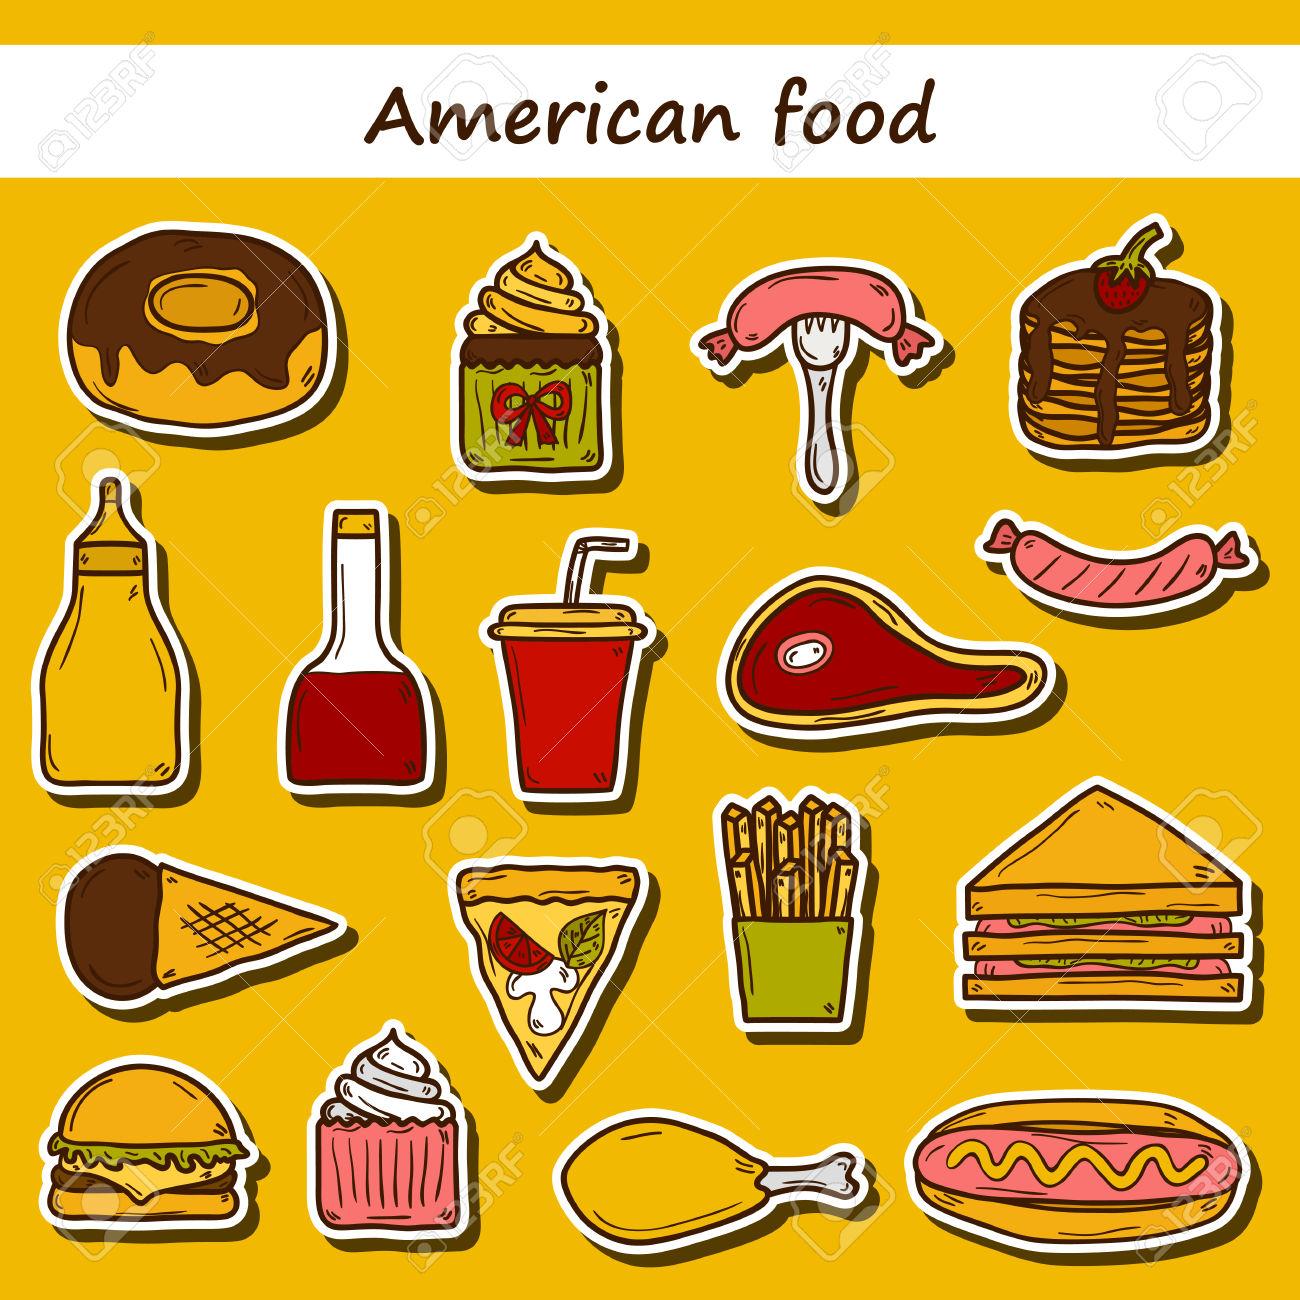 Set Of Cartoon Stickers On American Food Theme: Fried Potato.